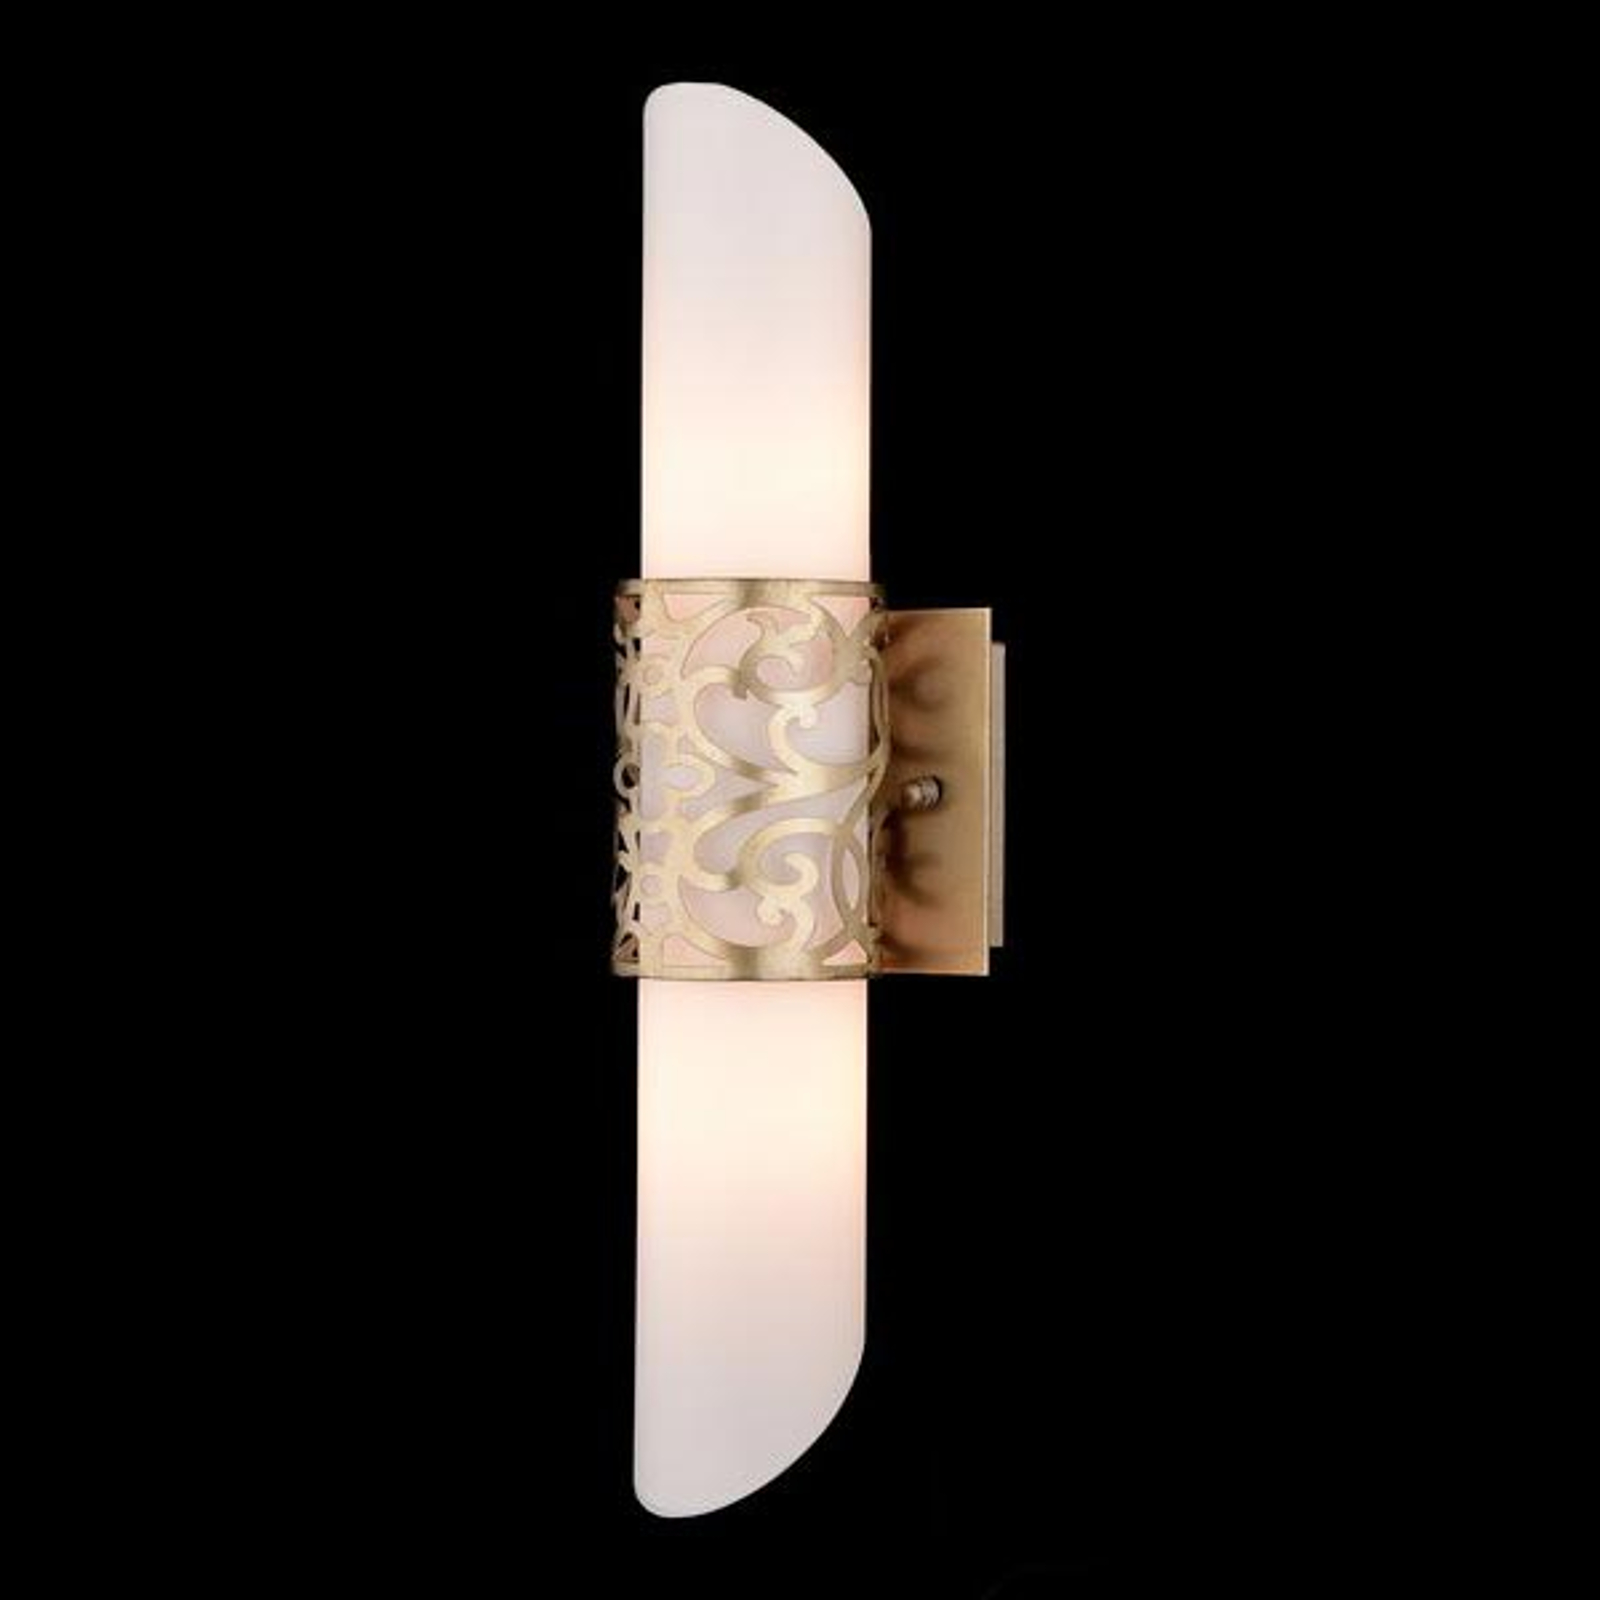 Röhrenförmige Glas-Wandleuchte Venera - gold